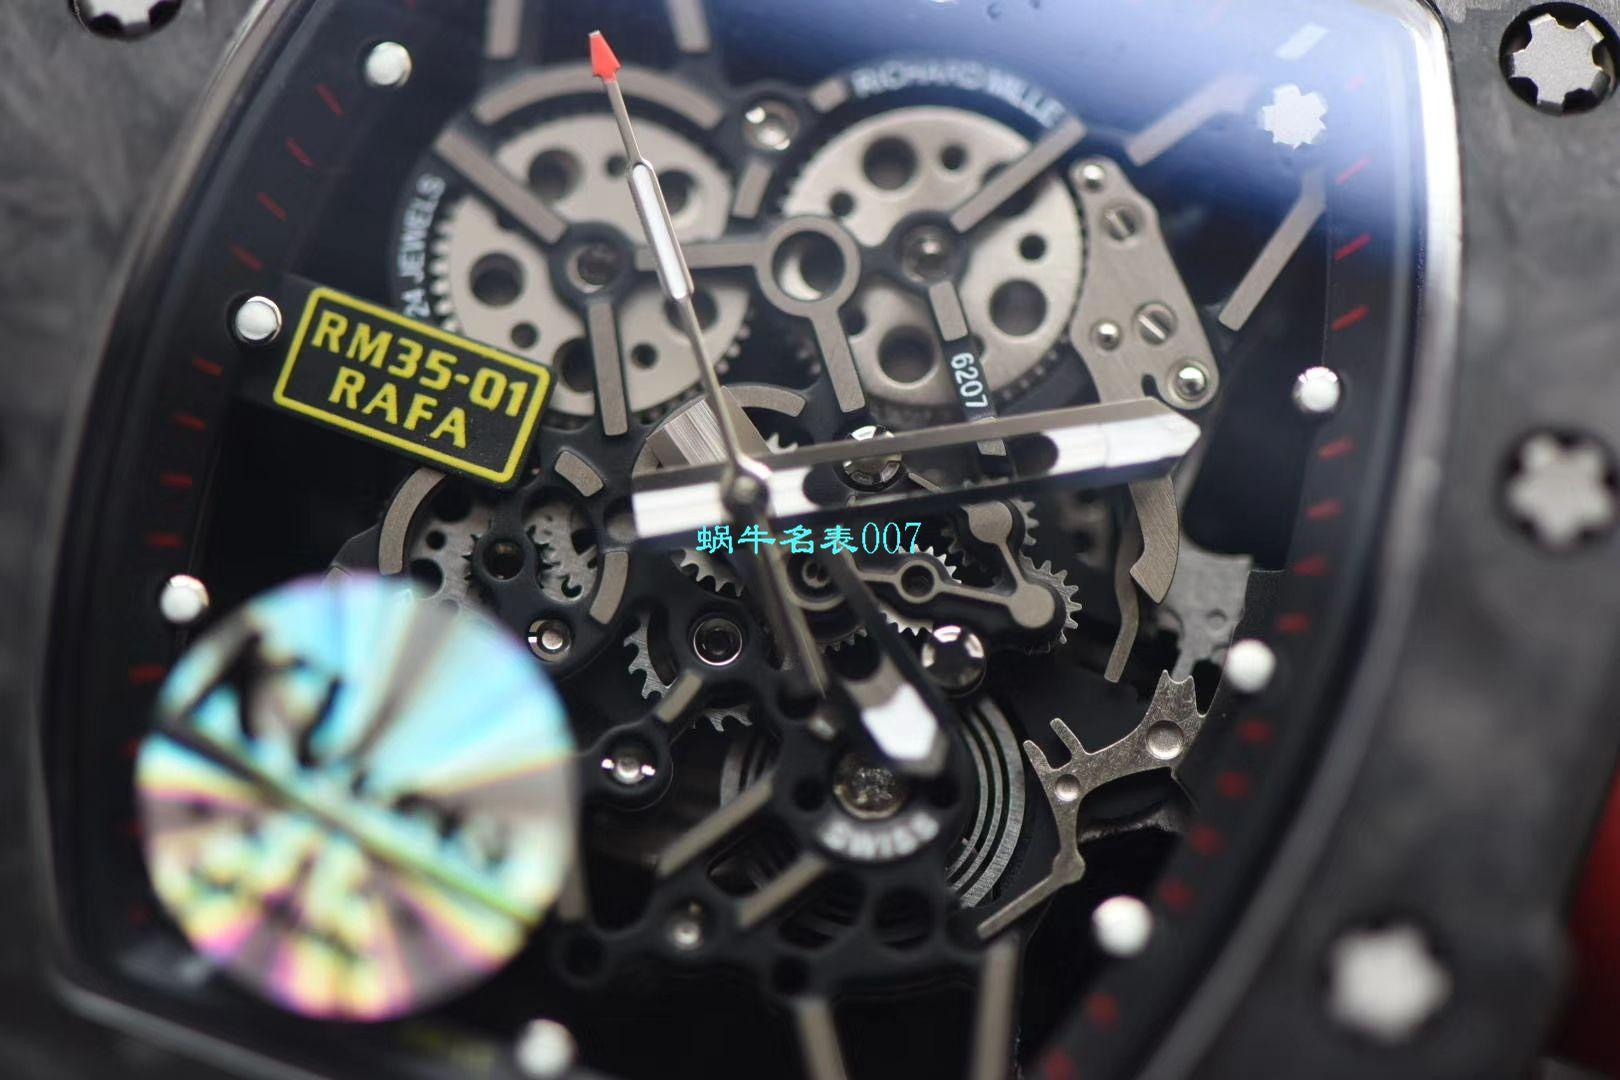 KVV3升级版本超A高仿RICHARD MILLE理查德米勒RM 35-01男士手表 / KV03501V303